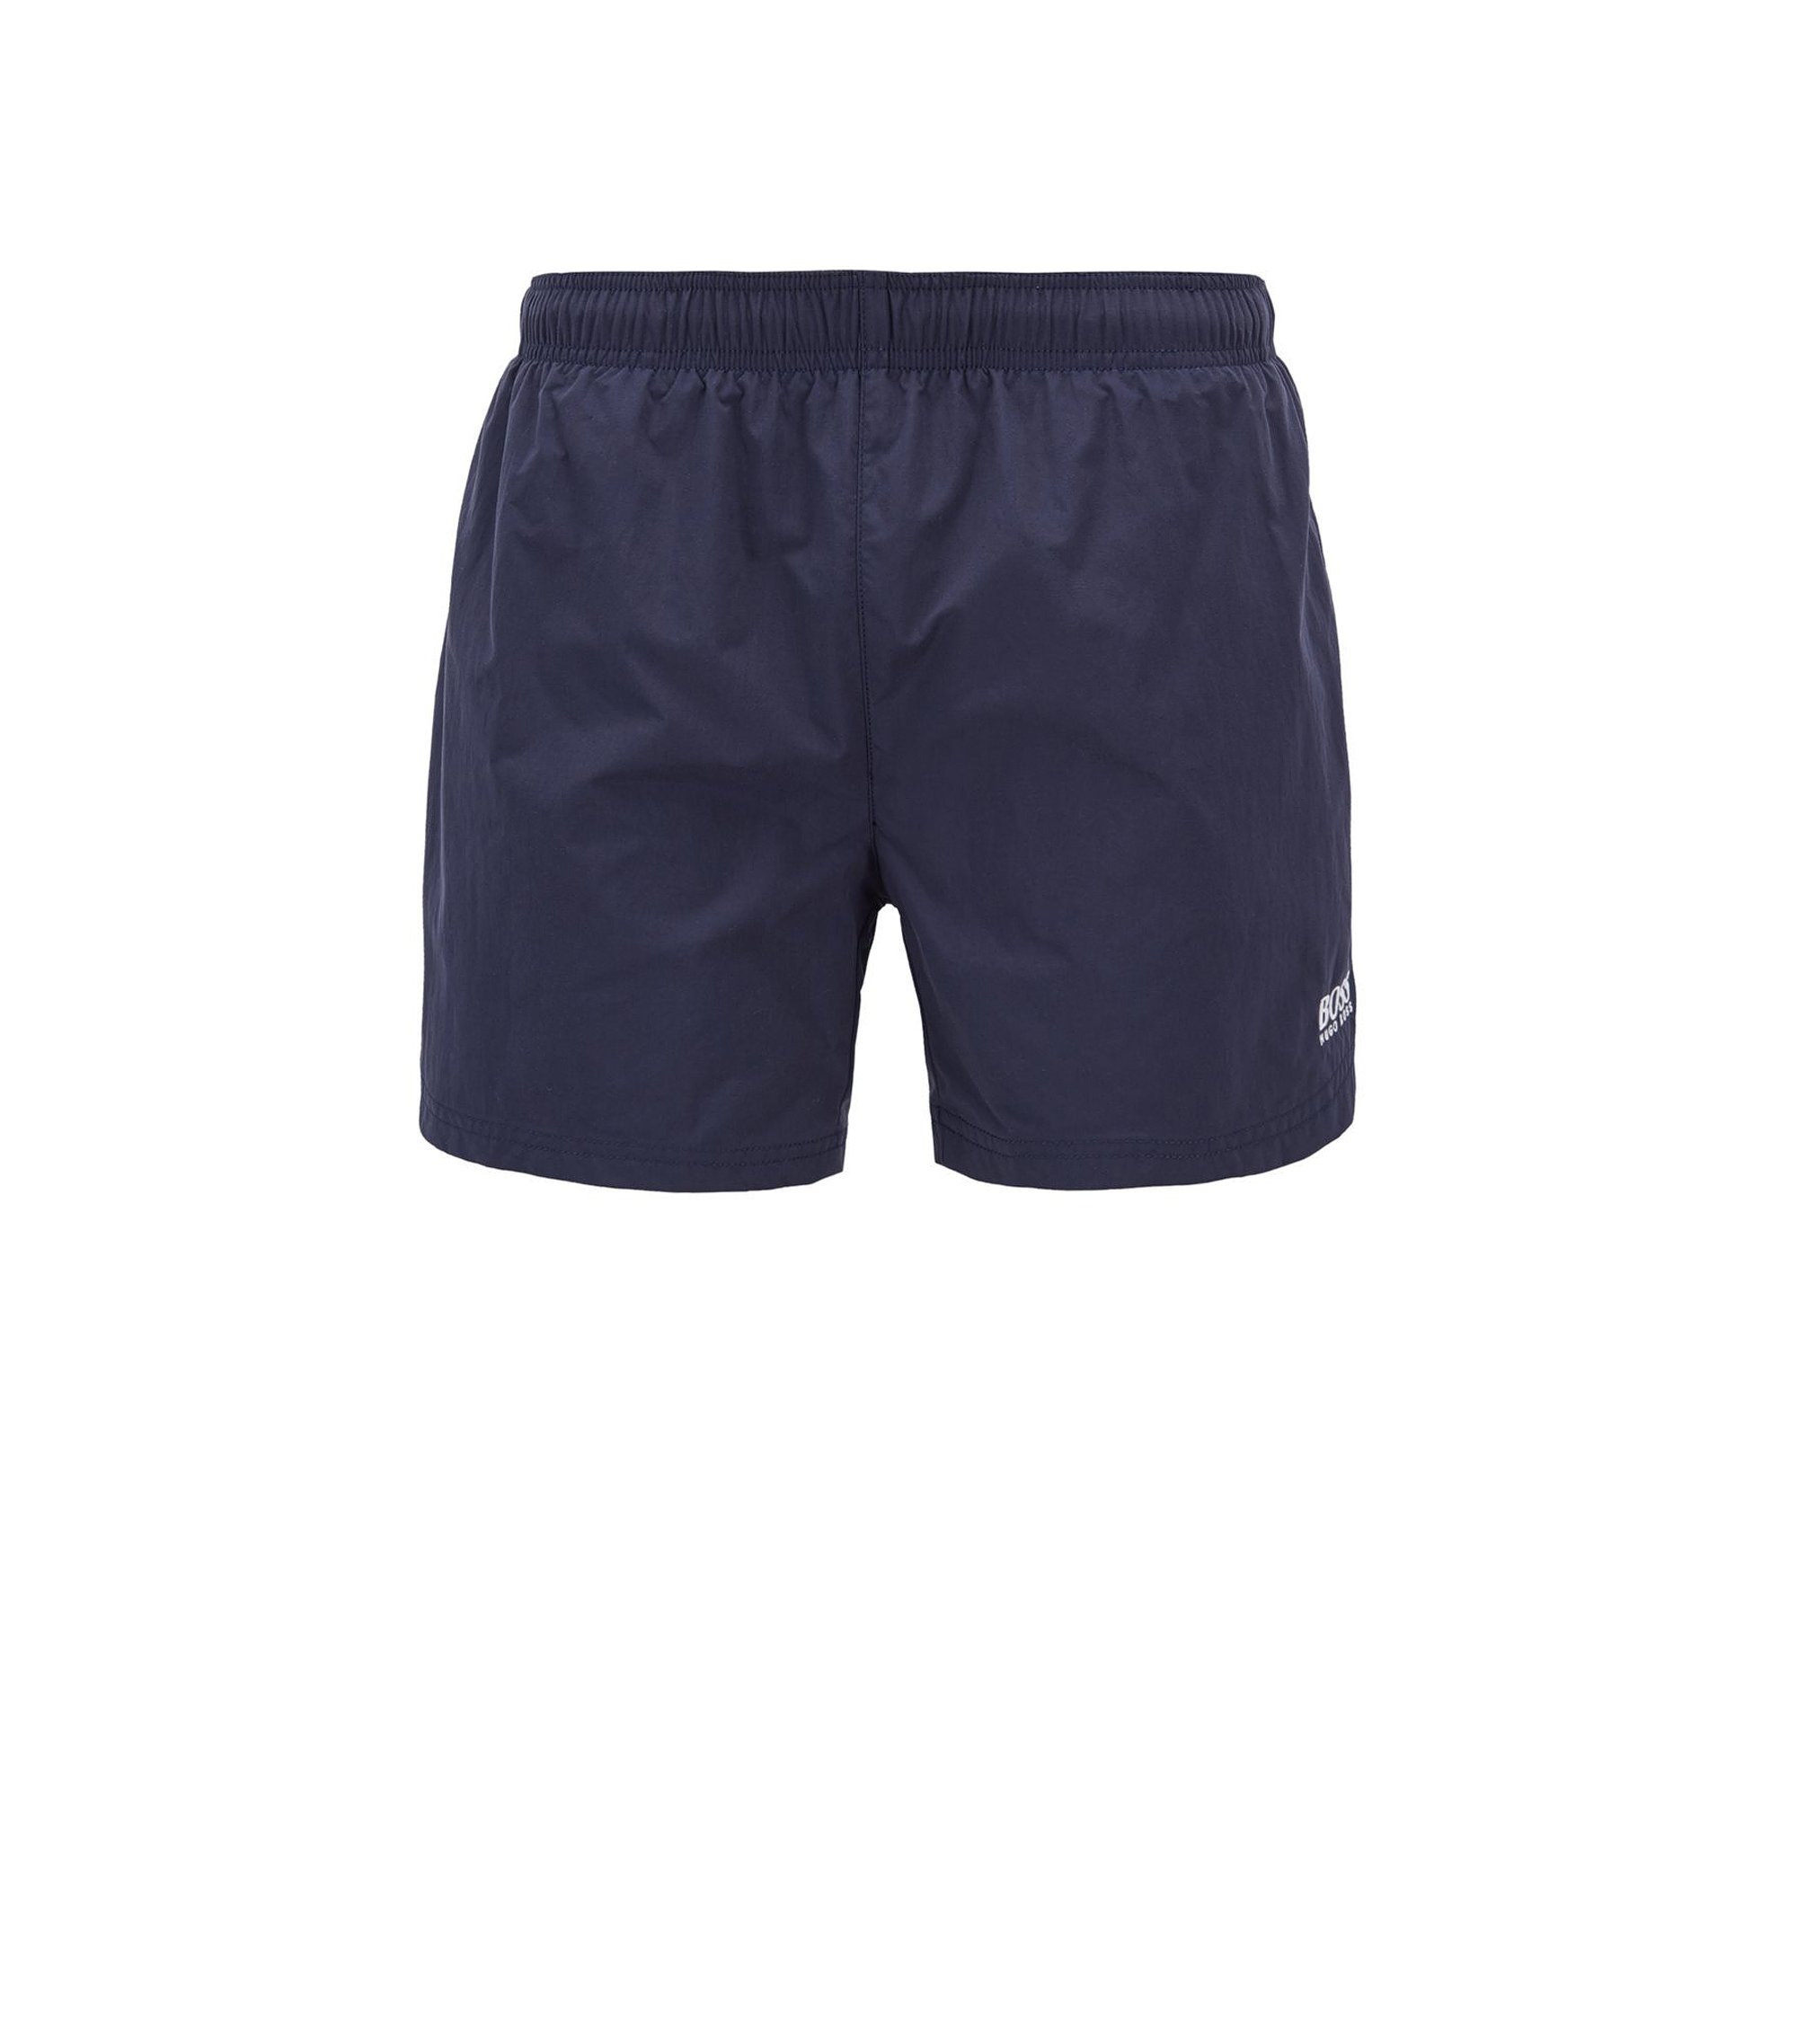 Sneldrogende zwemshort met logostiksel, Donkerblauw